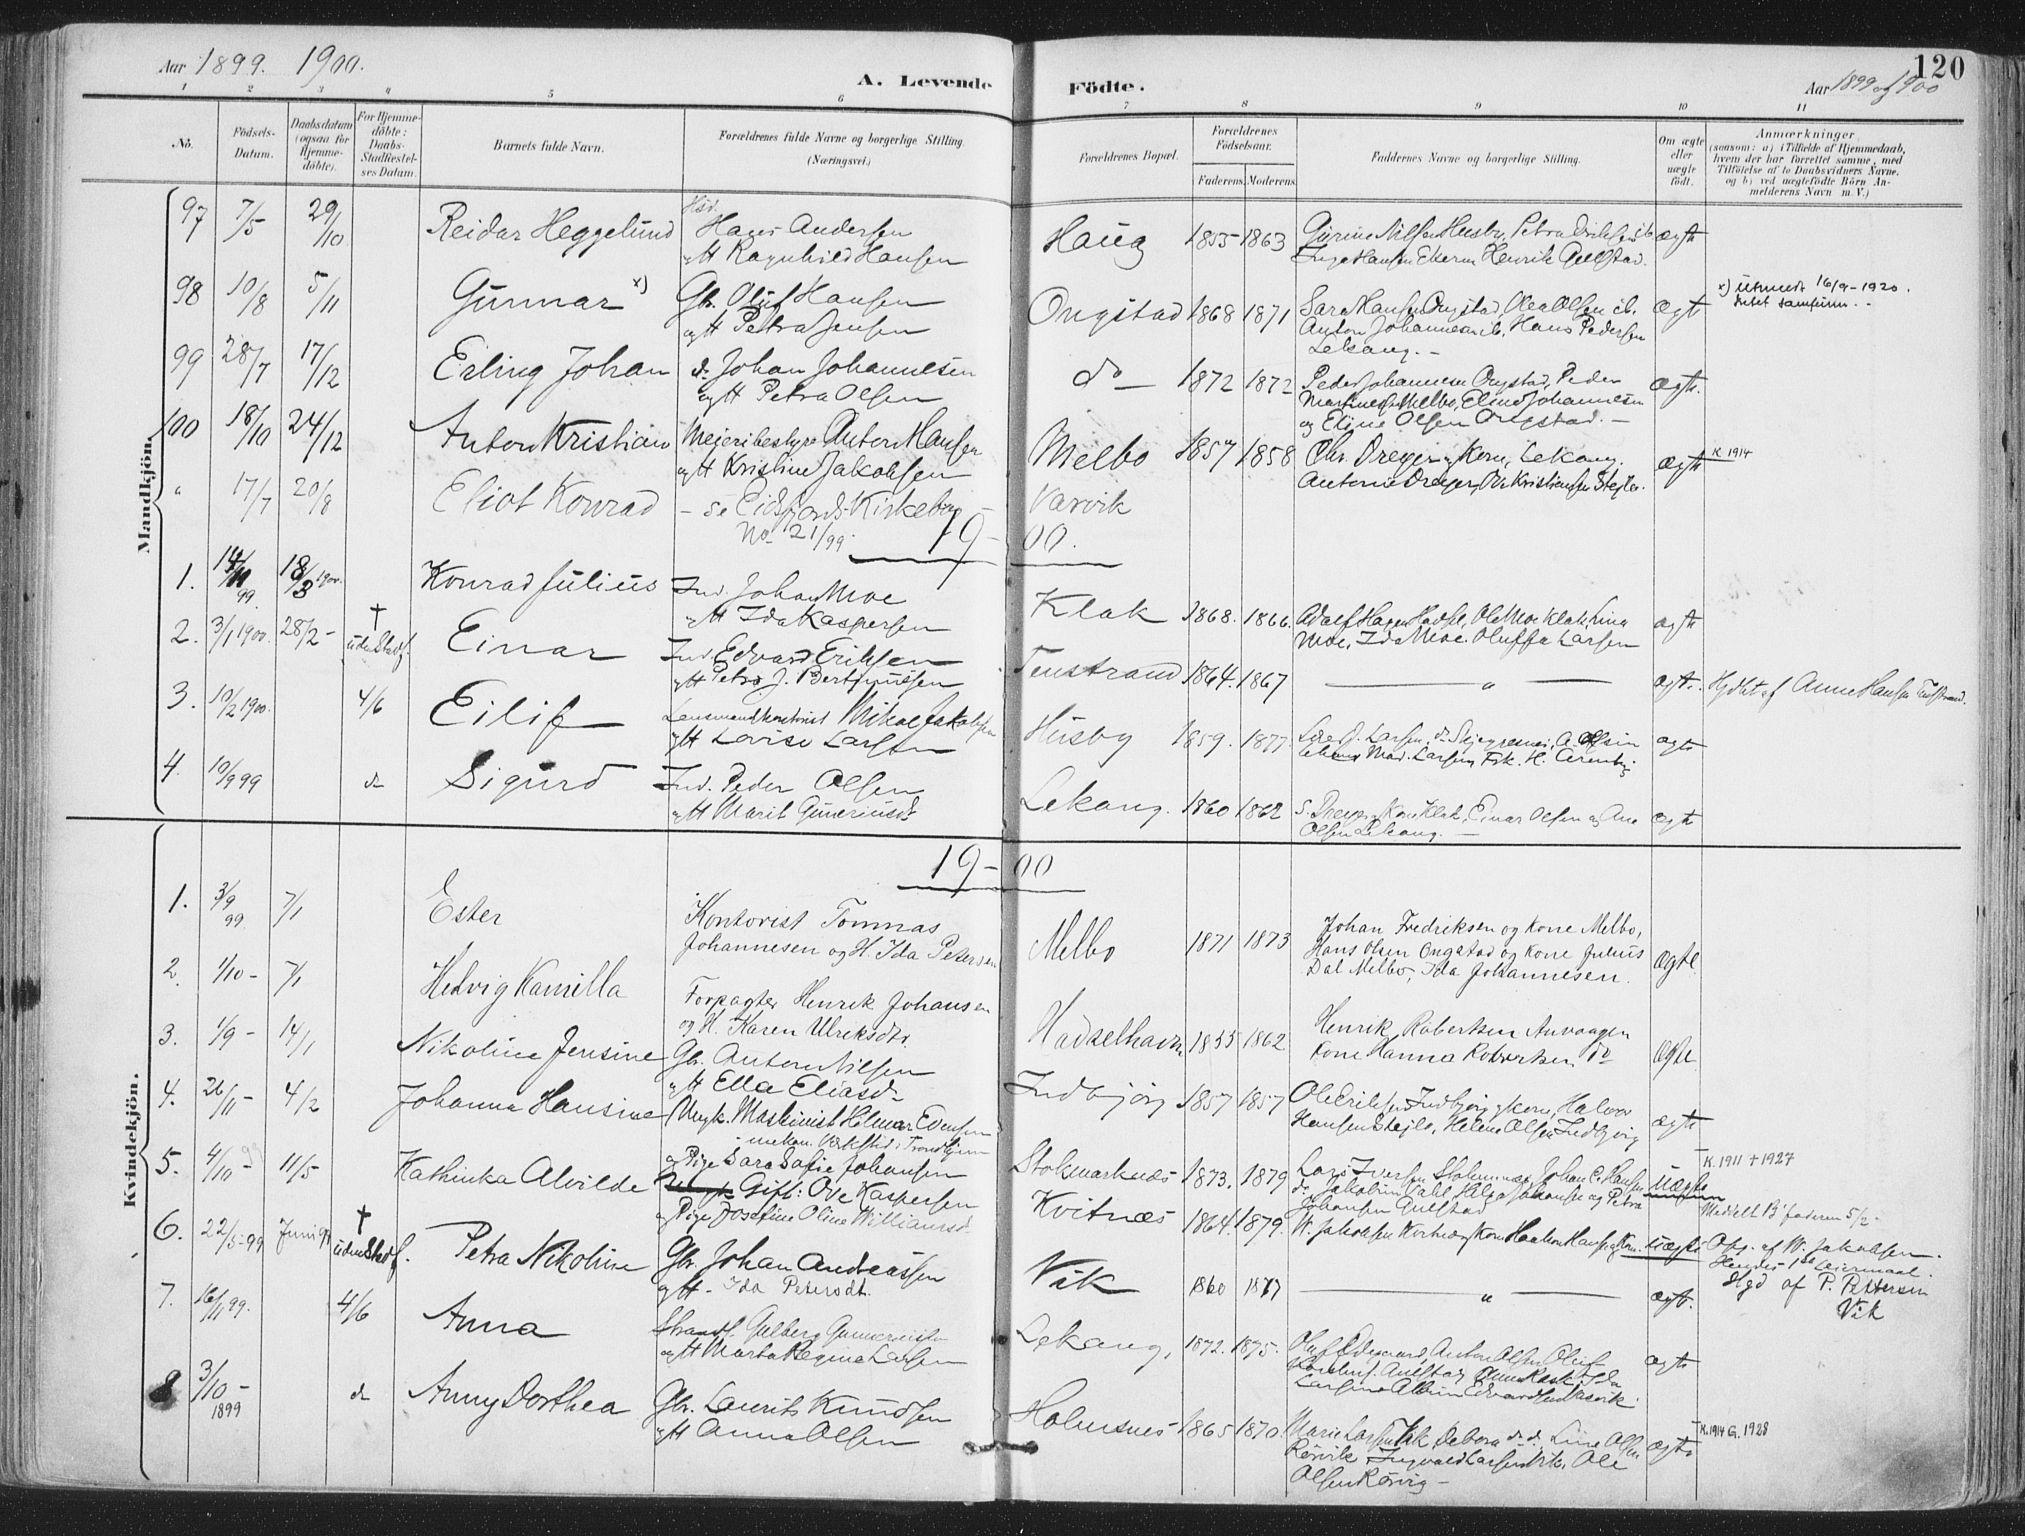 SAT, Ministerialprotokoller, klokkerbøker og fødselsregistre - Nordland, 888/L1246: Ministerialbok nr. 888A12, 1891-1903, s. 120